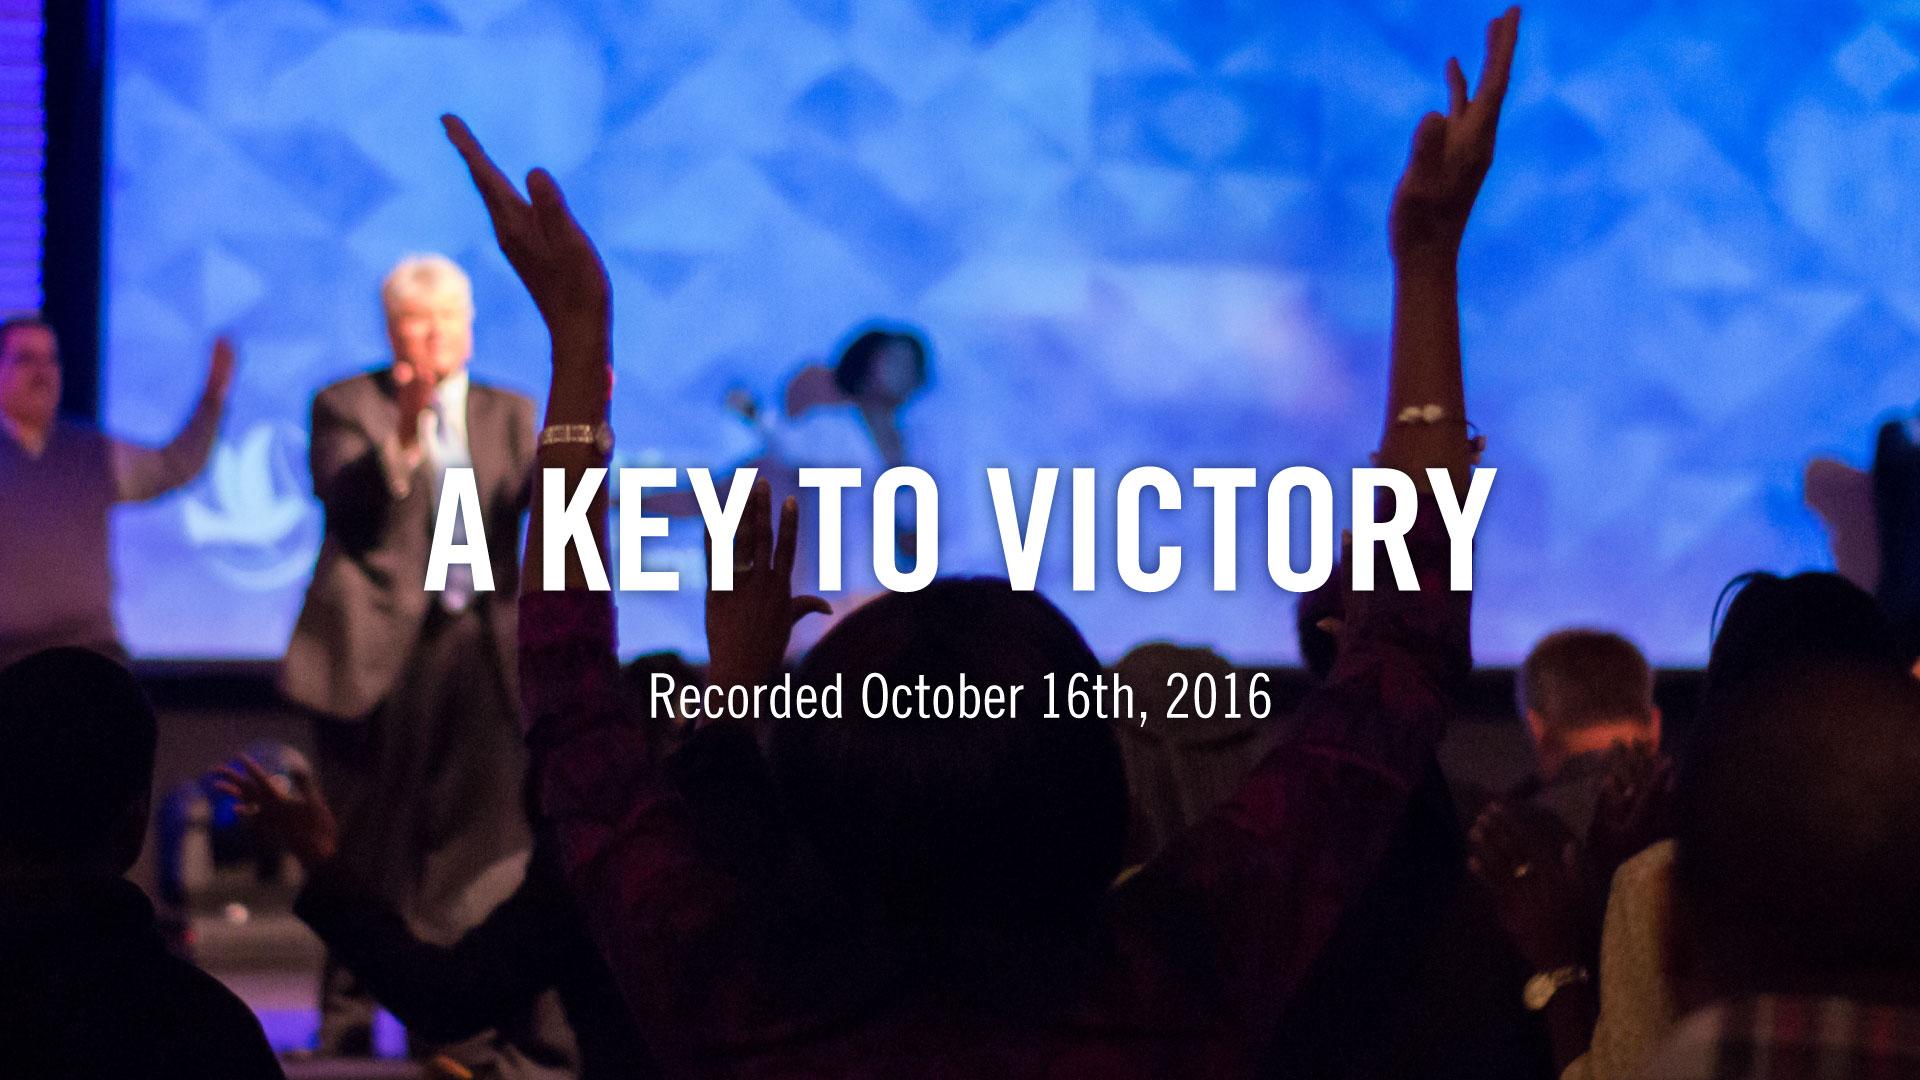 a-key-to-victory_theme_pastor-steve-mccartt-family-worship-center-florence_web